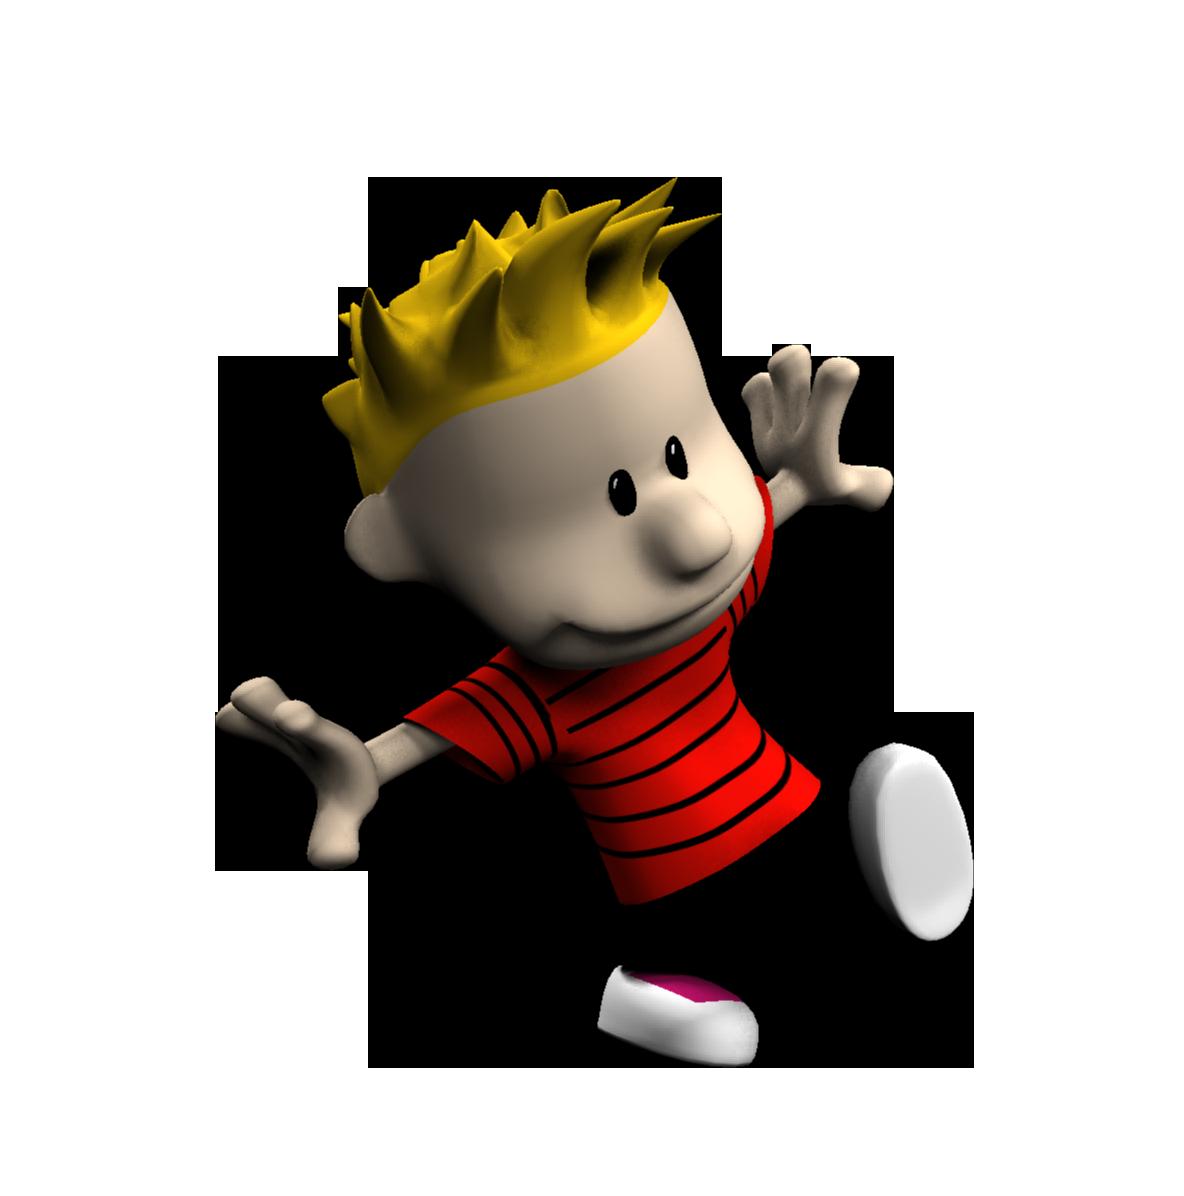 Calvin by peterhirschberg